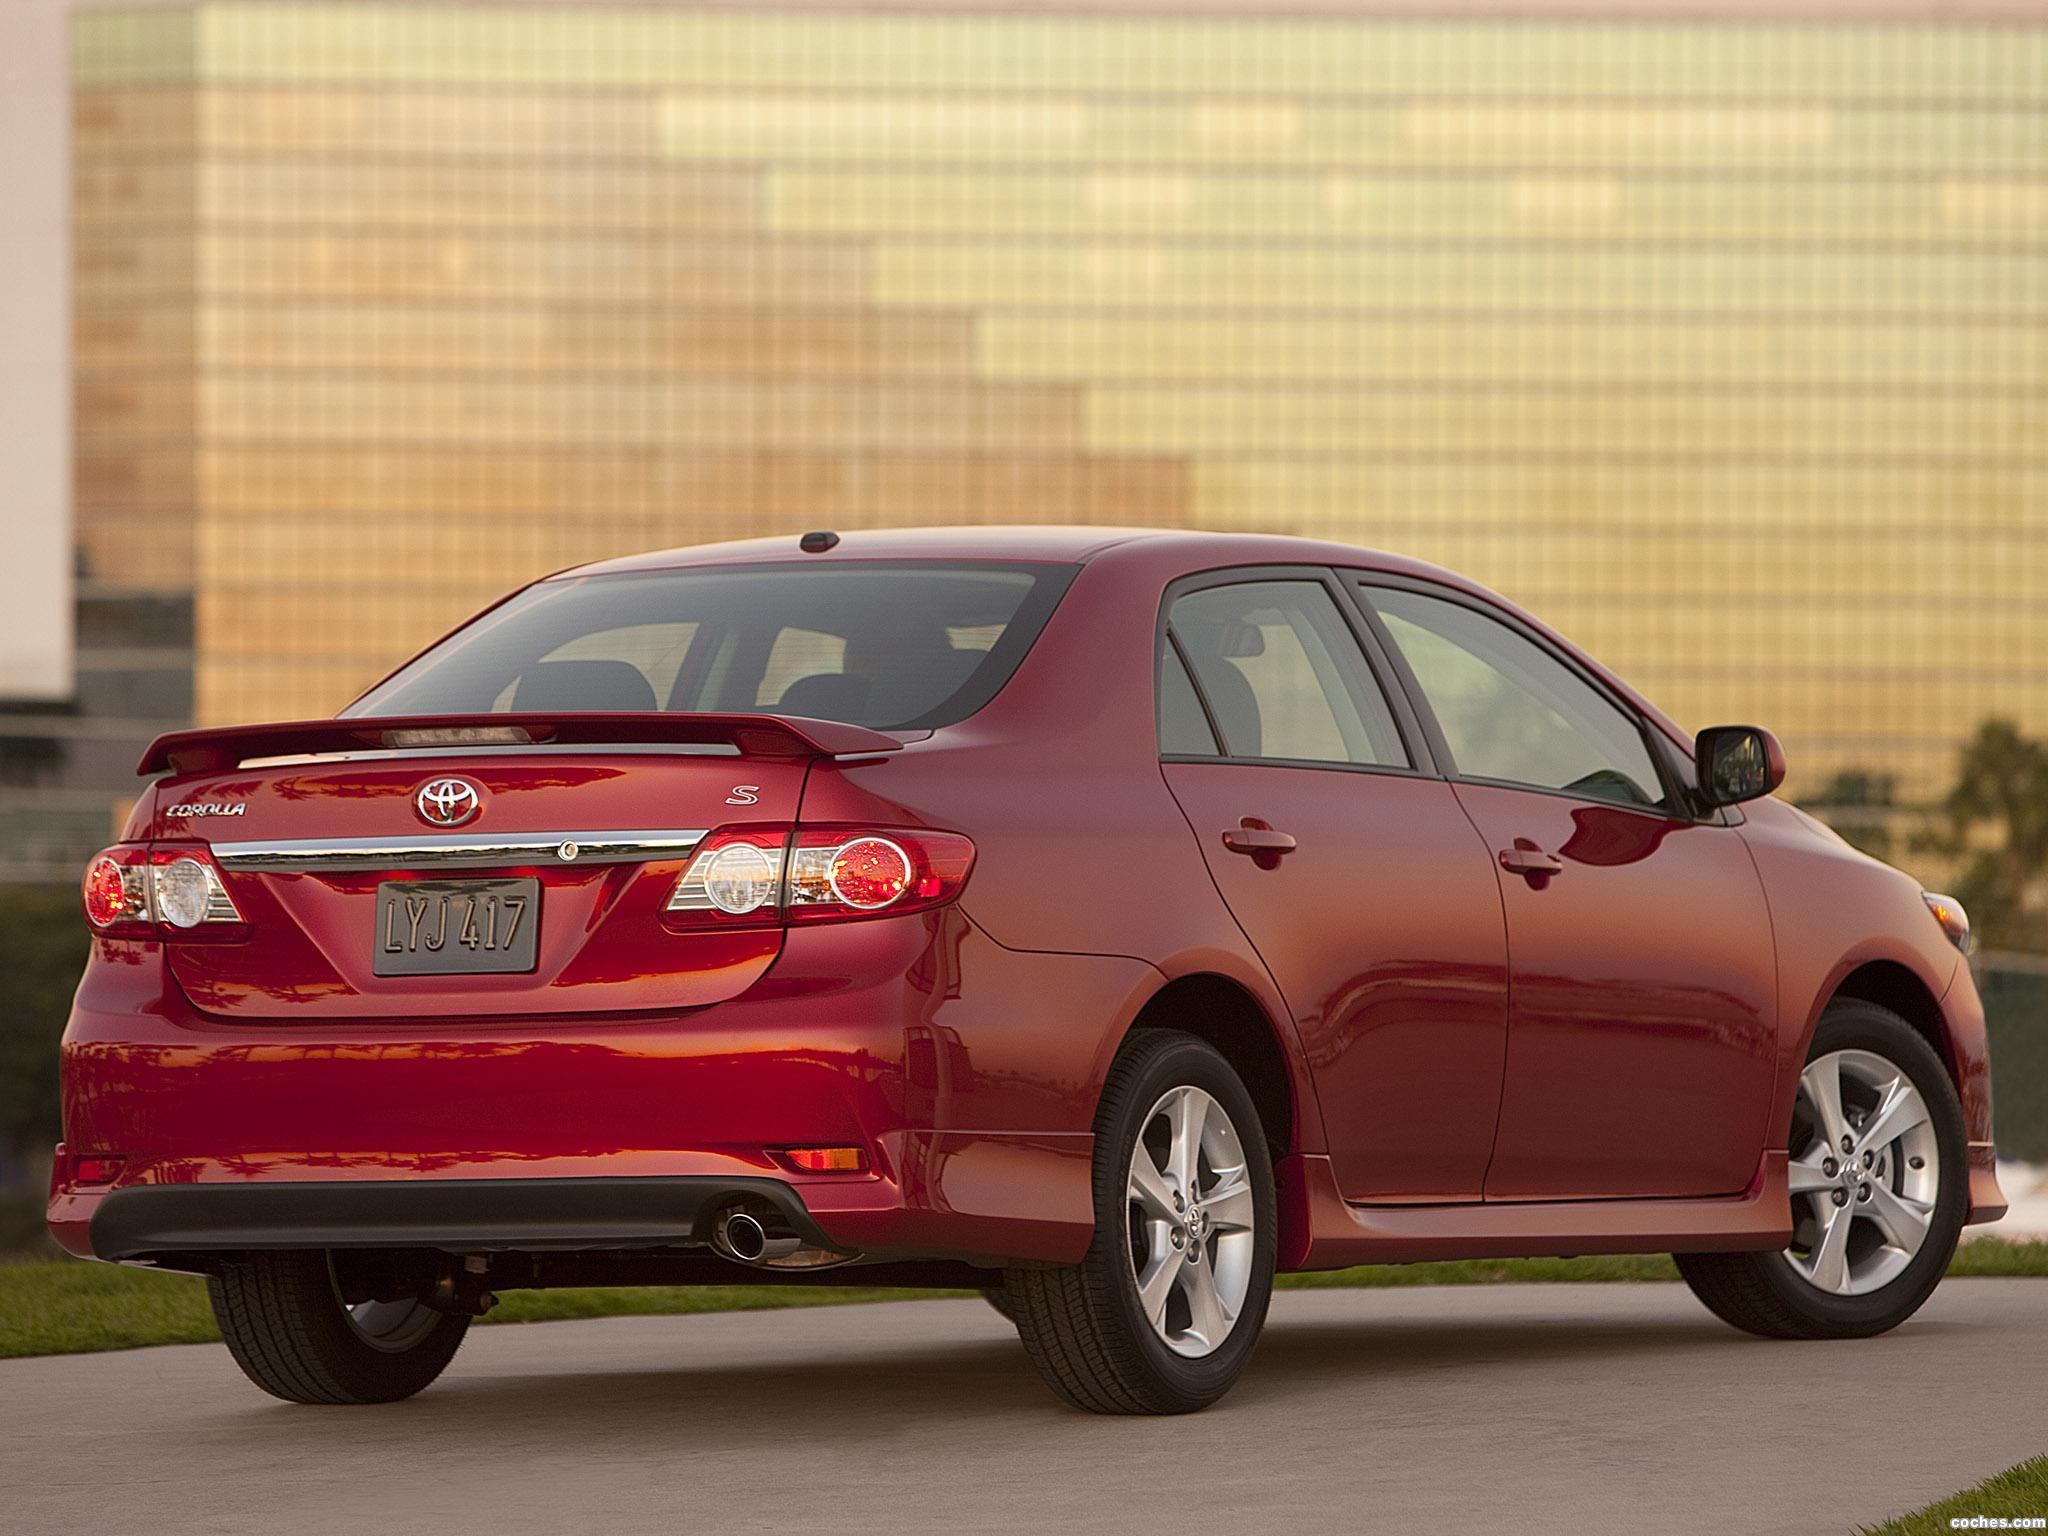 Foto 13 de Toyota Corolla USA 2011